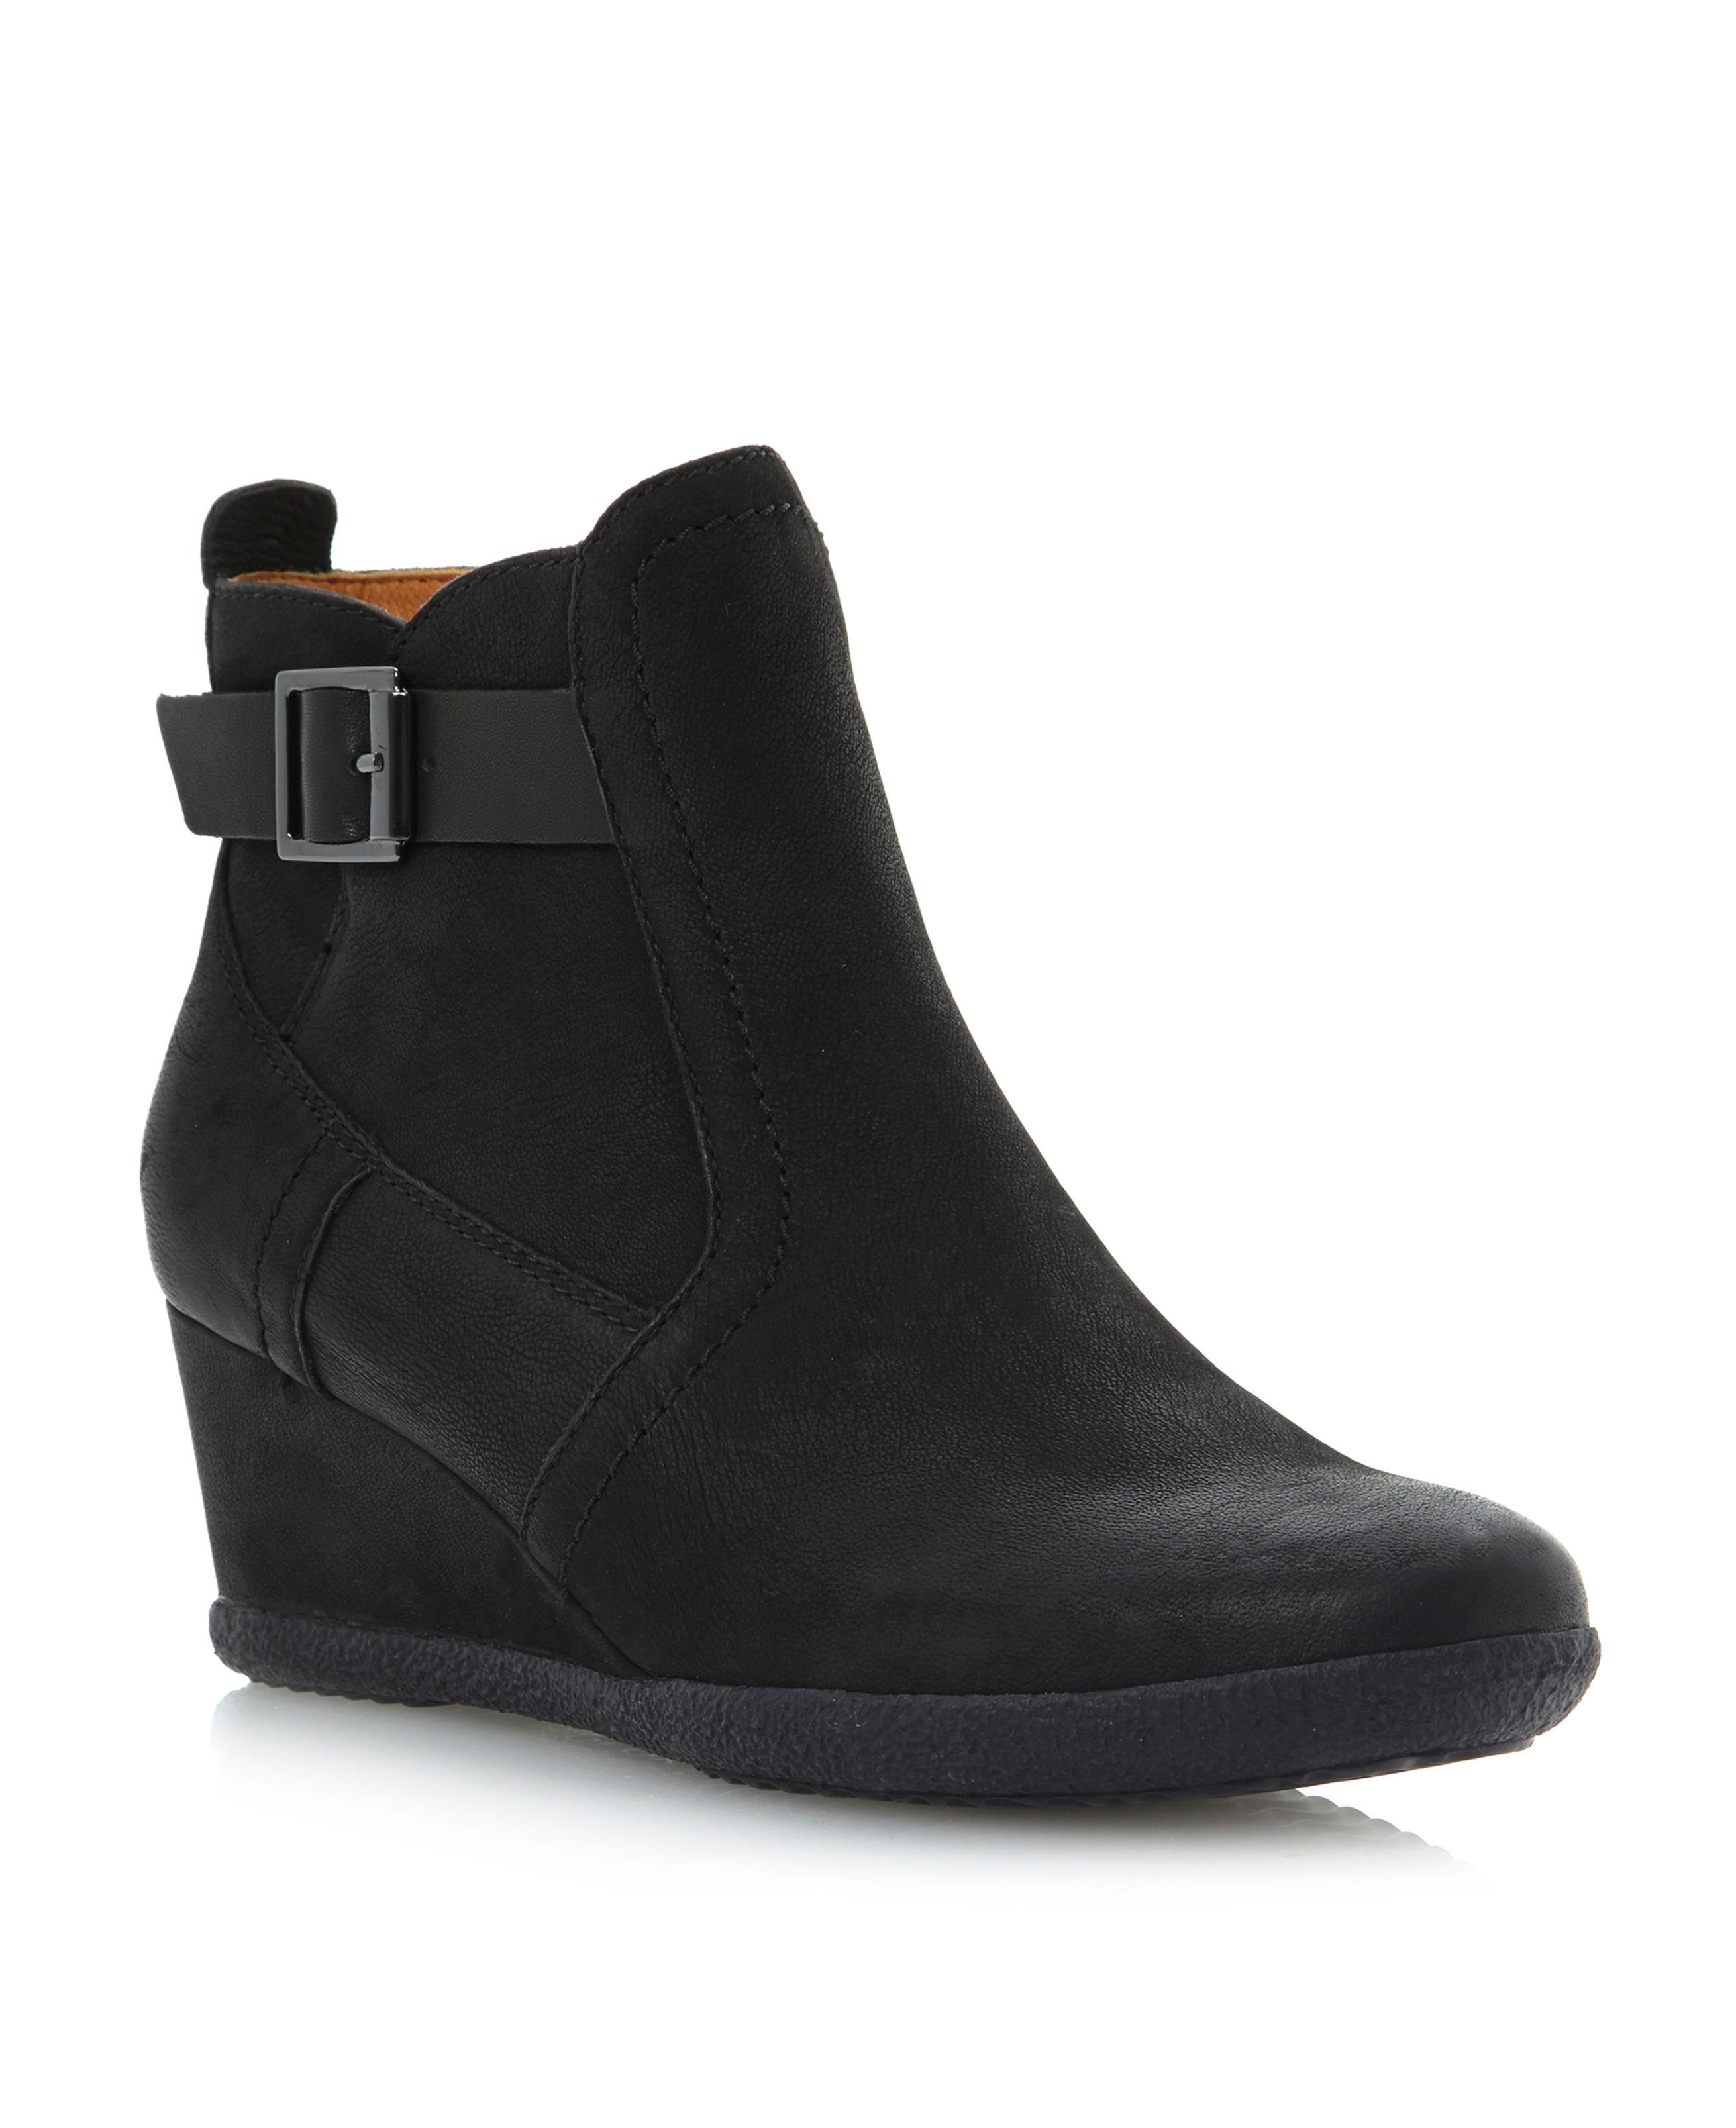 geox amelia side buckle wedge bootsy in black black suede